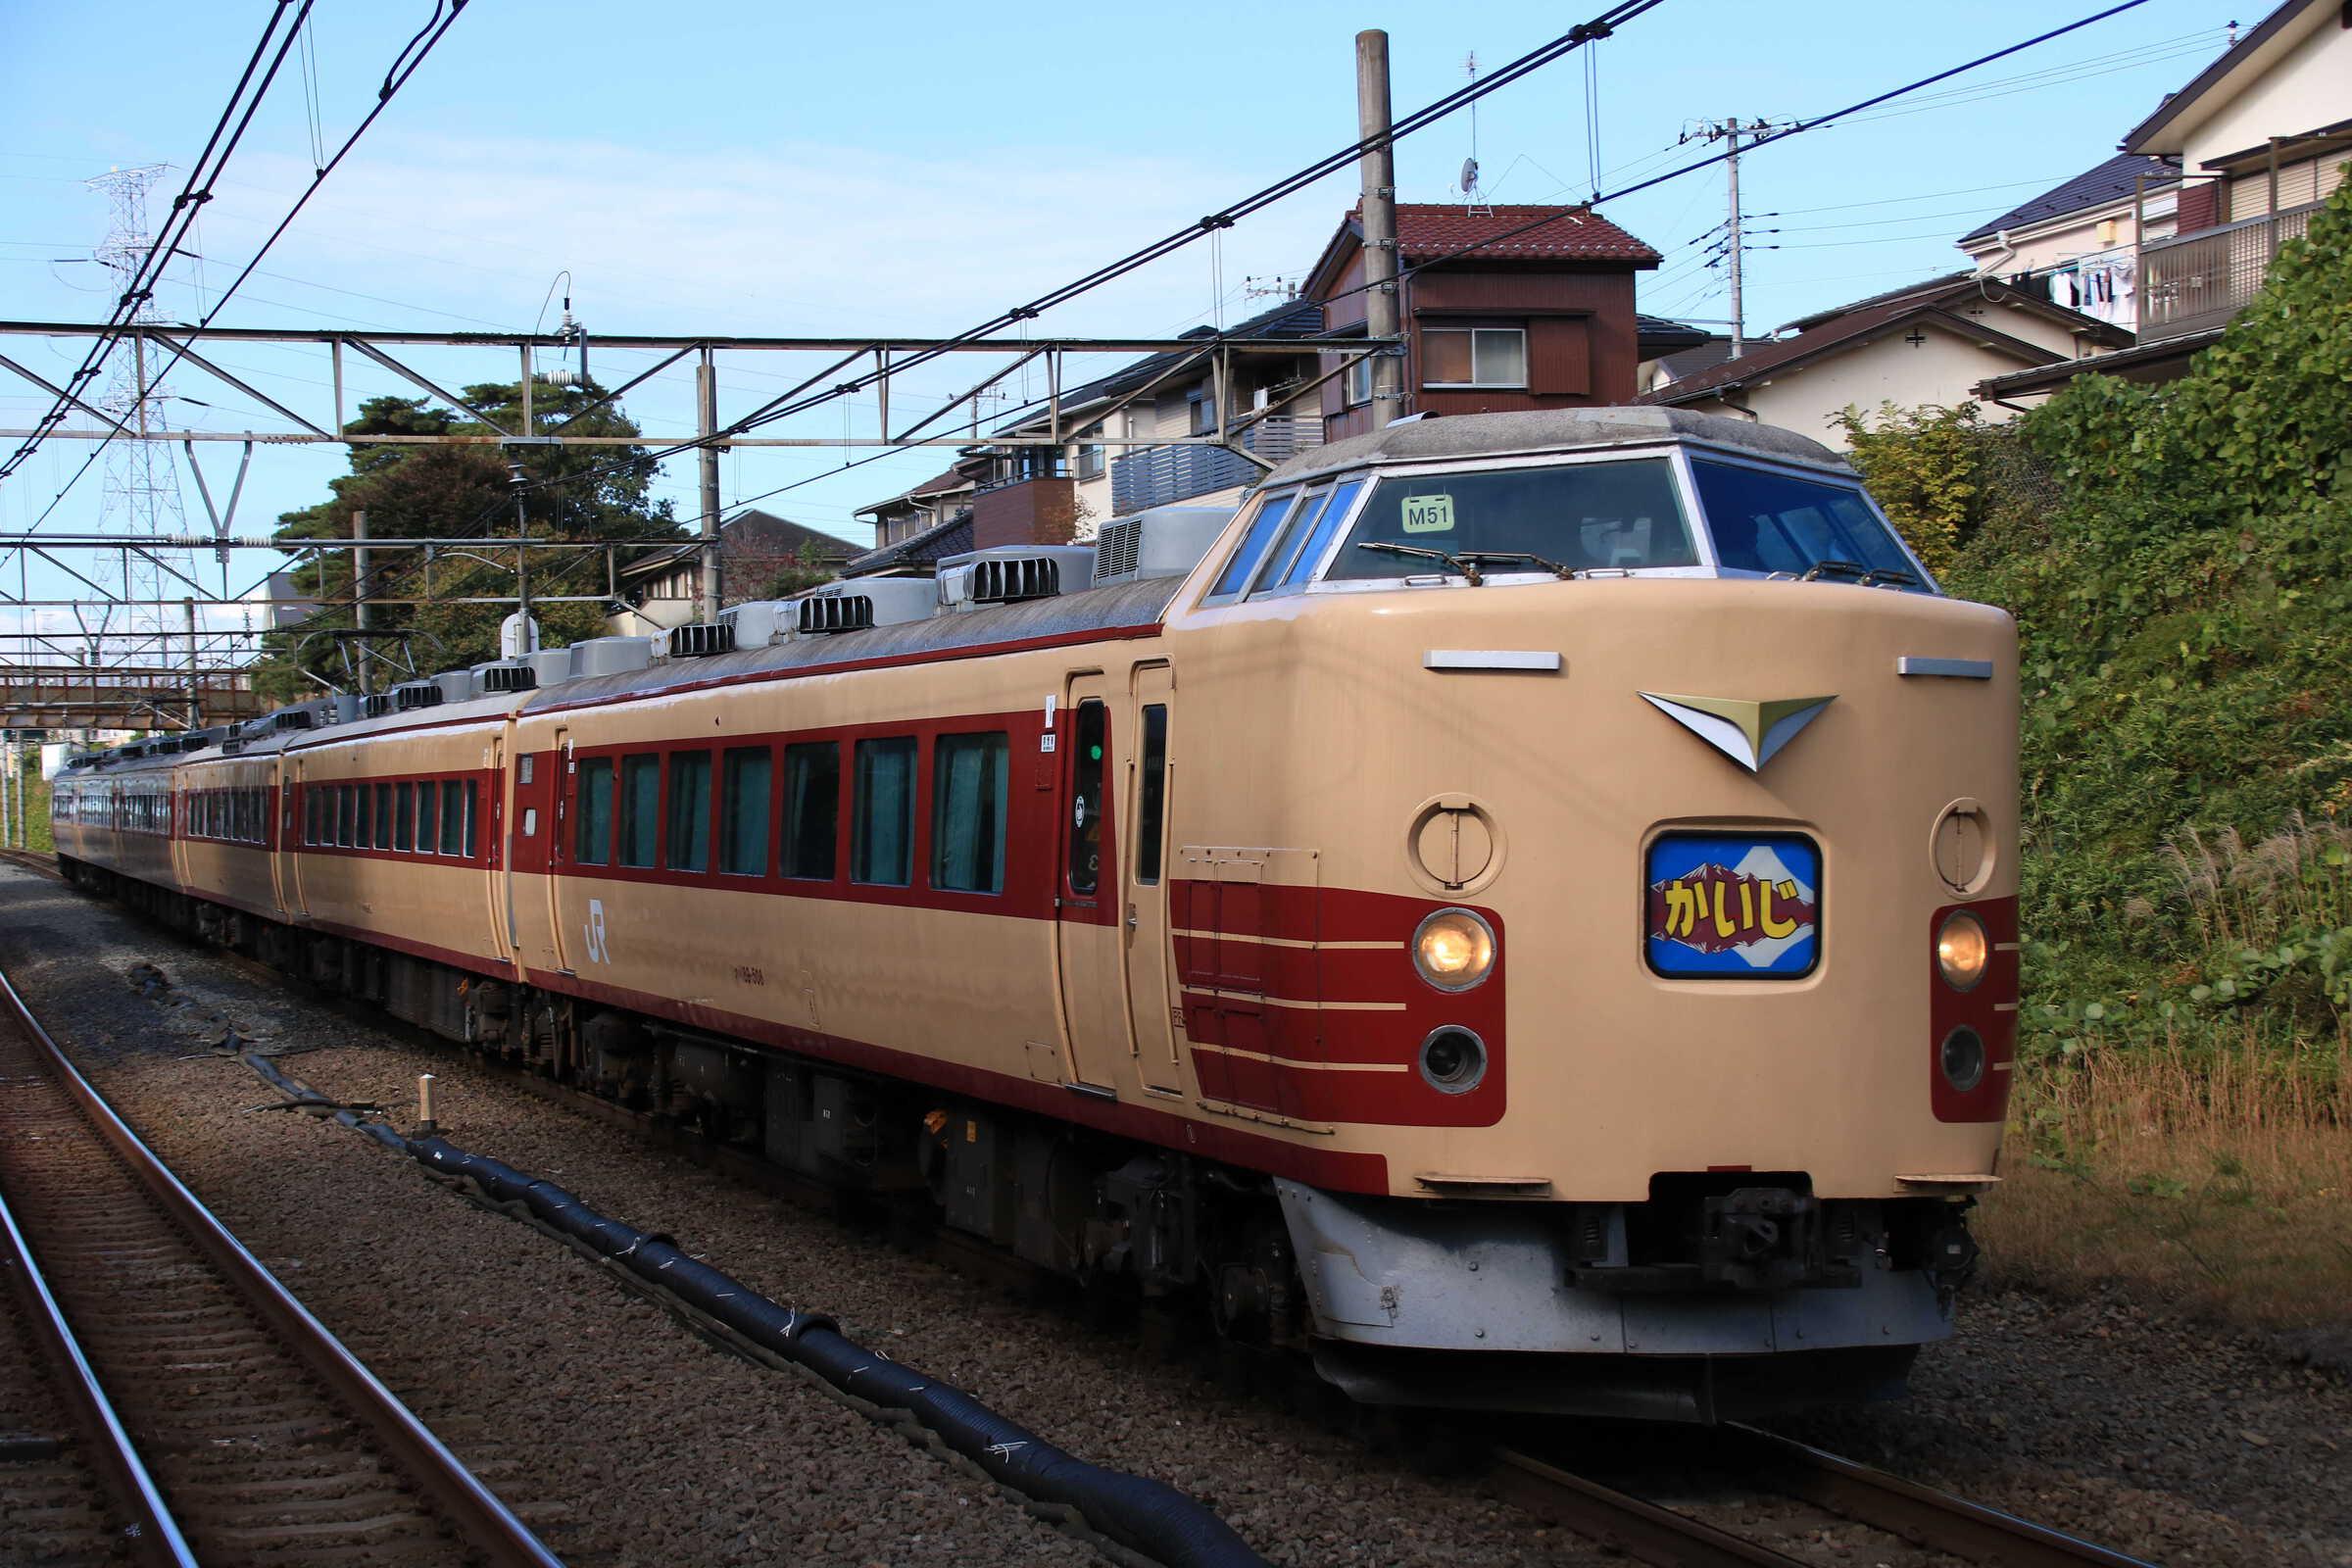 9056M 特急 かいじ186号 189系 八トタM51編成